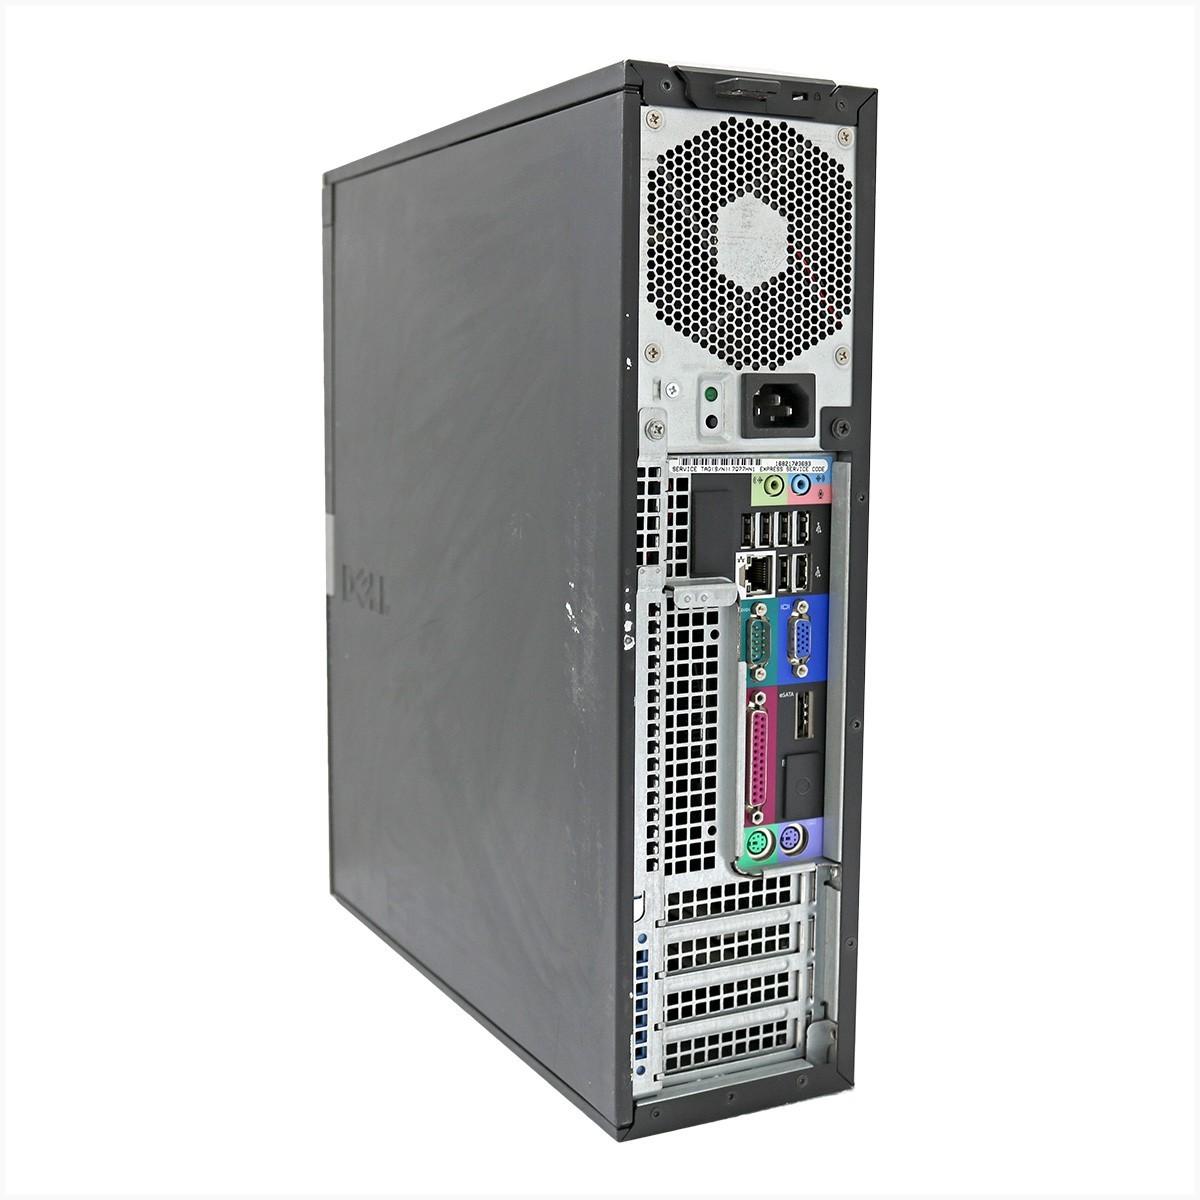 Desktop optiplex 980 slim i5 4gb 250gb - usado